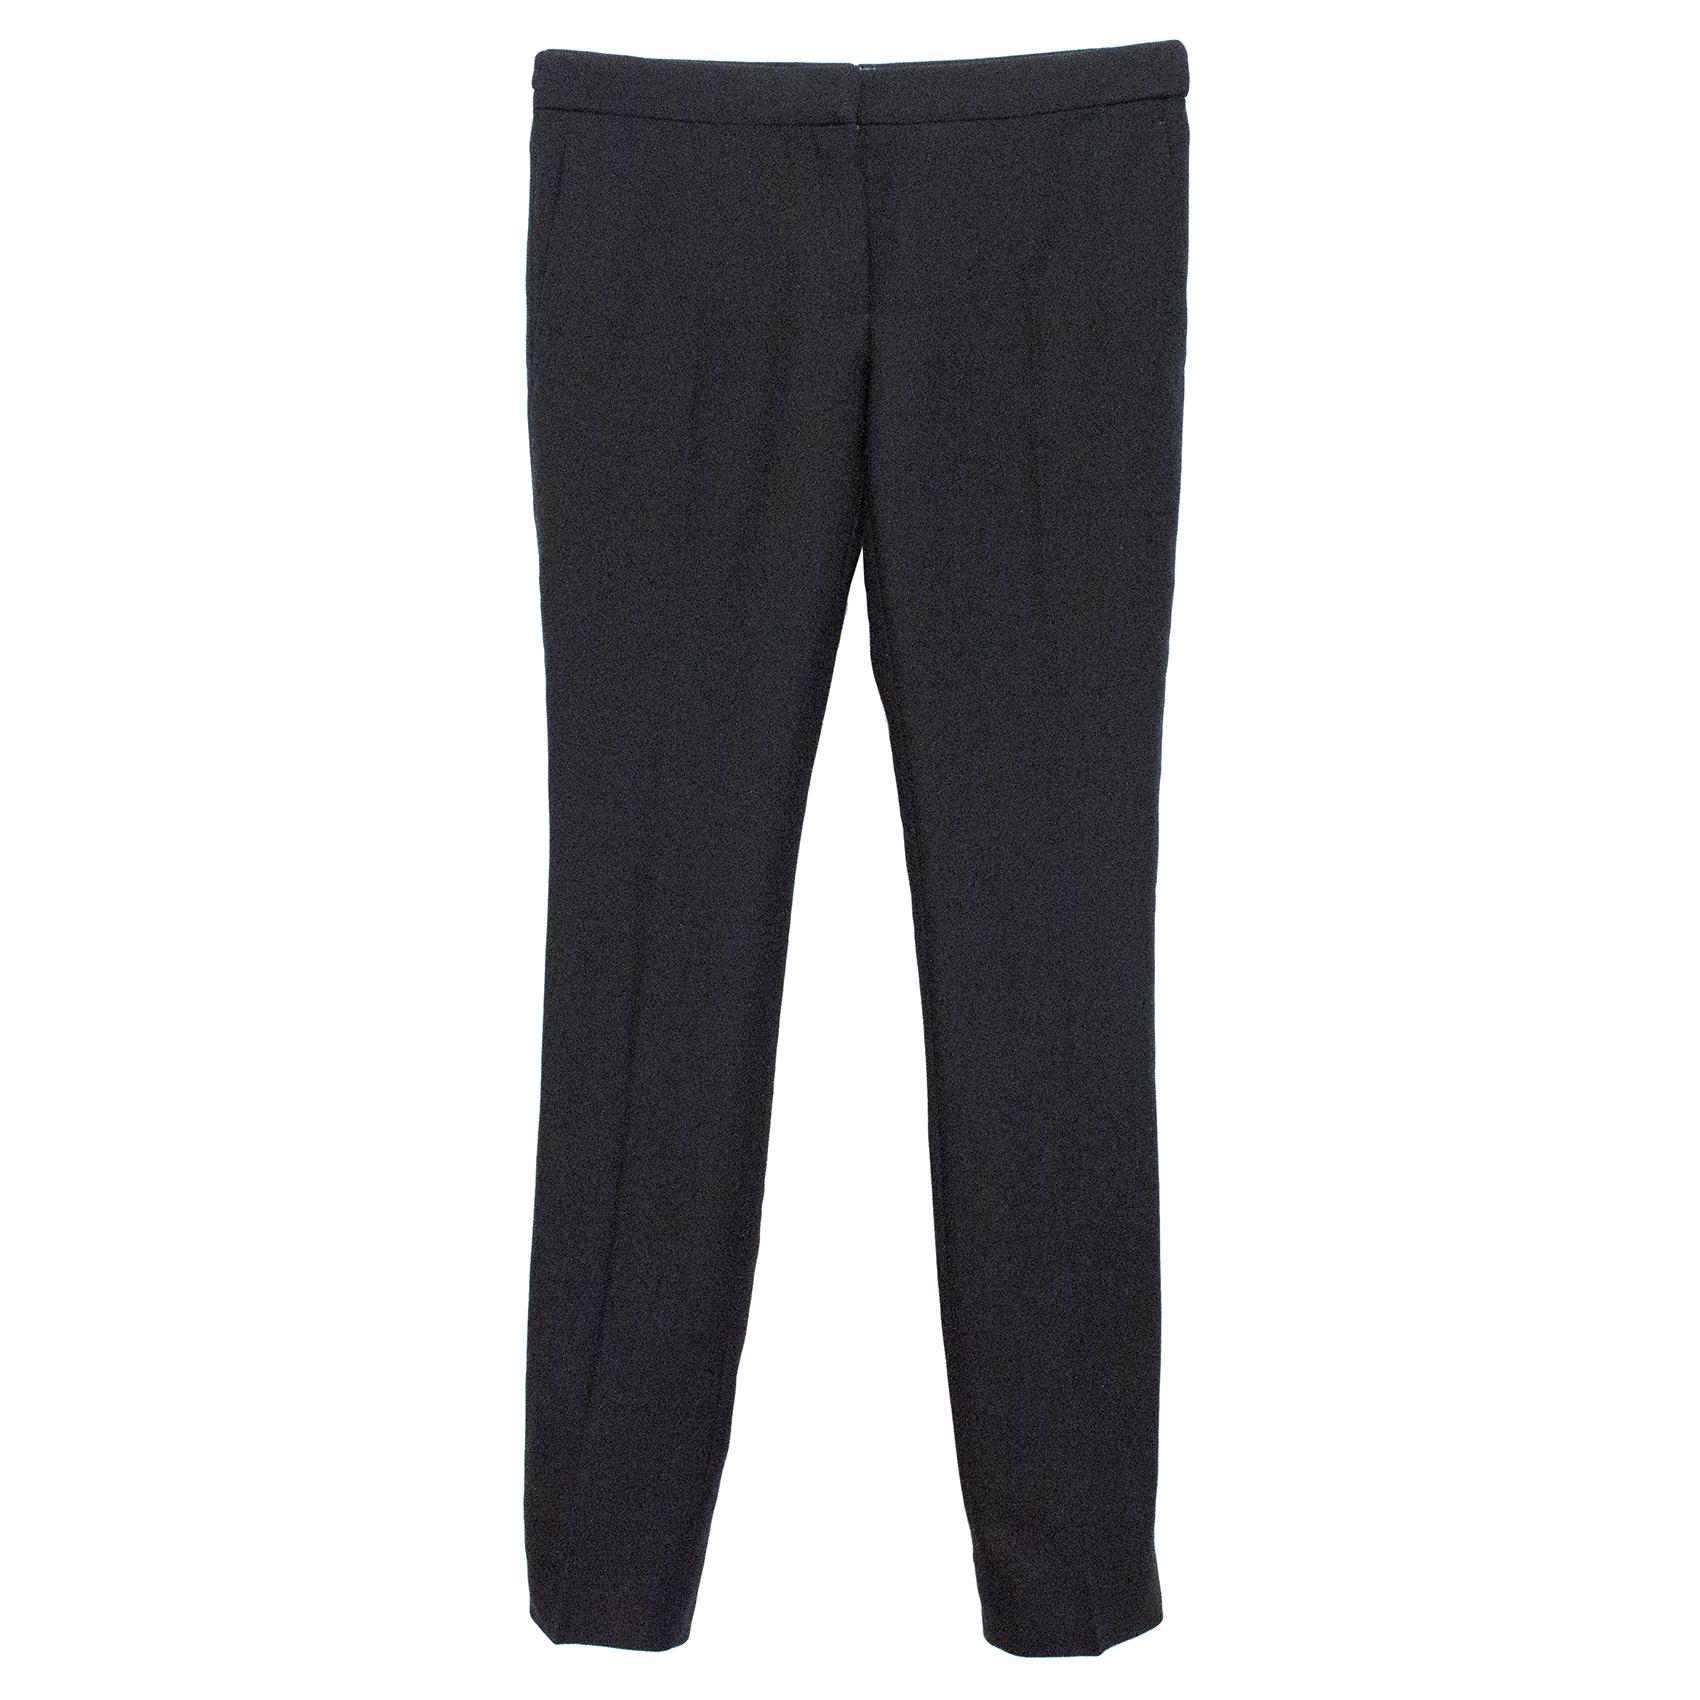 Burberry Prorsum Black Woven Trousers